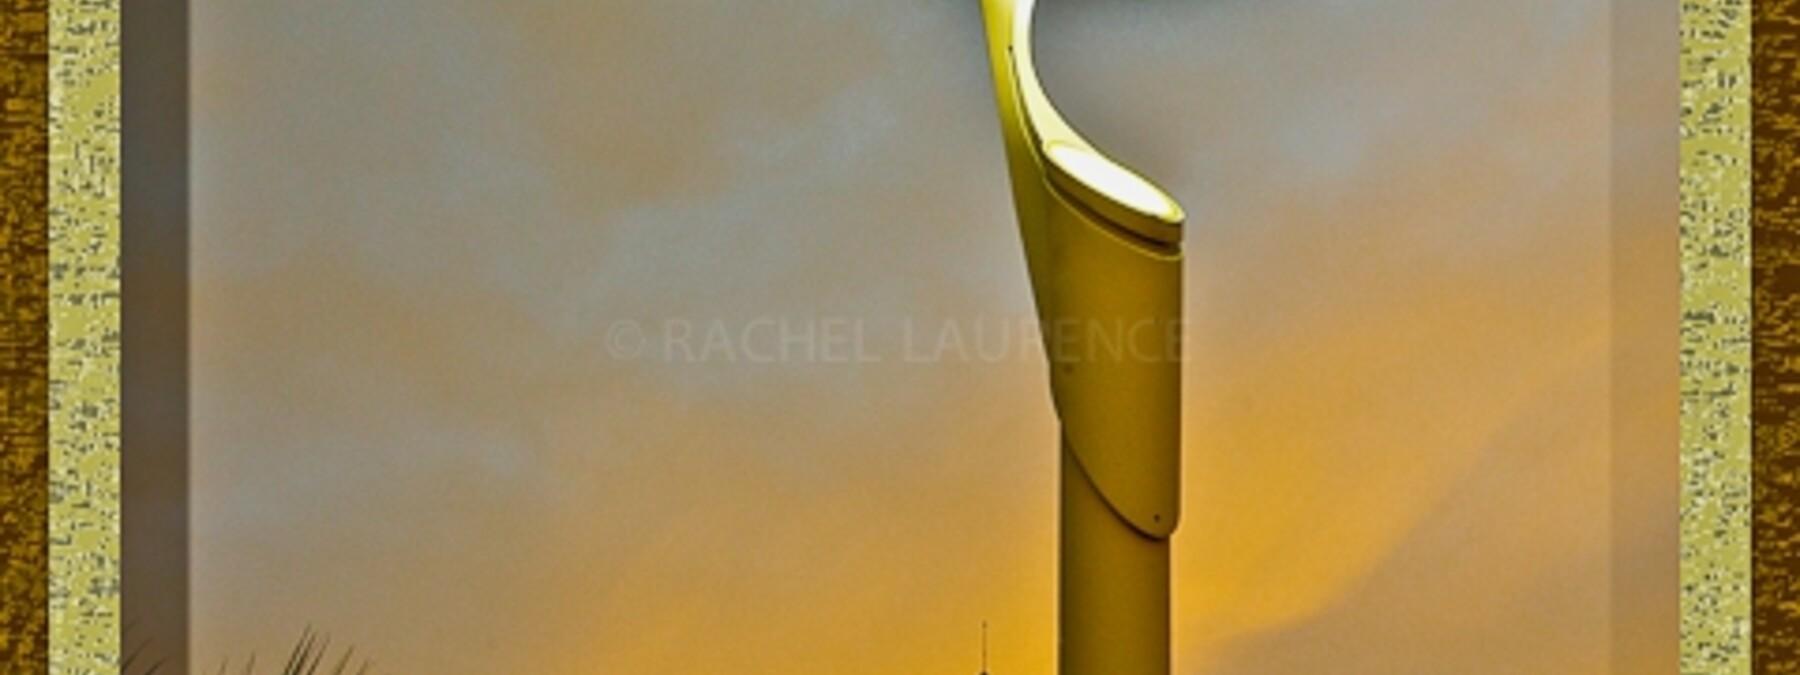 Rachel LAURENCE